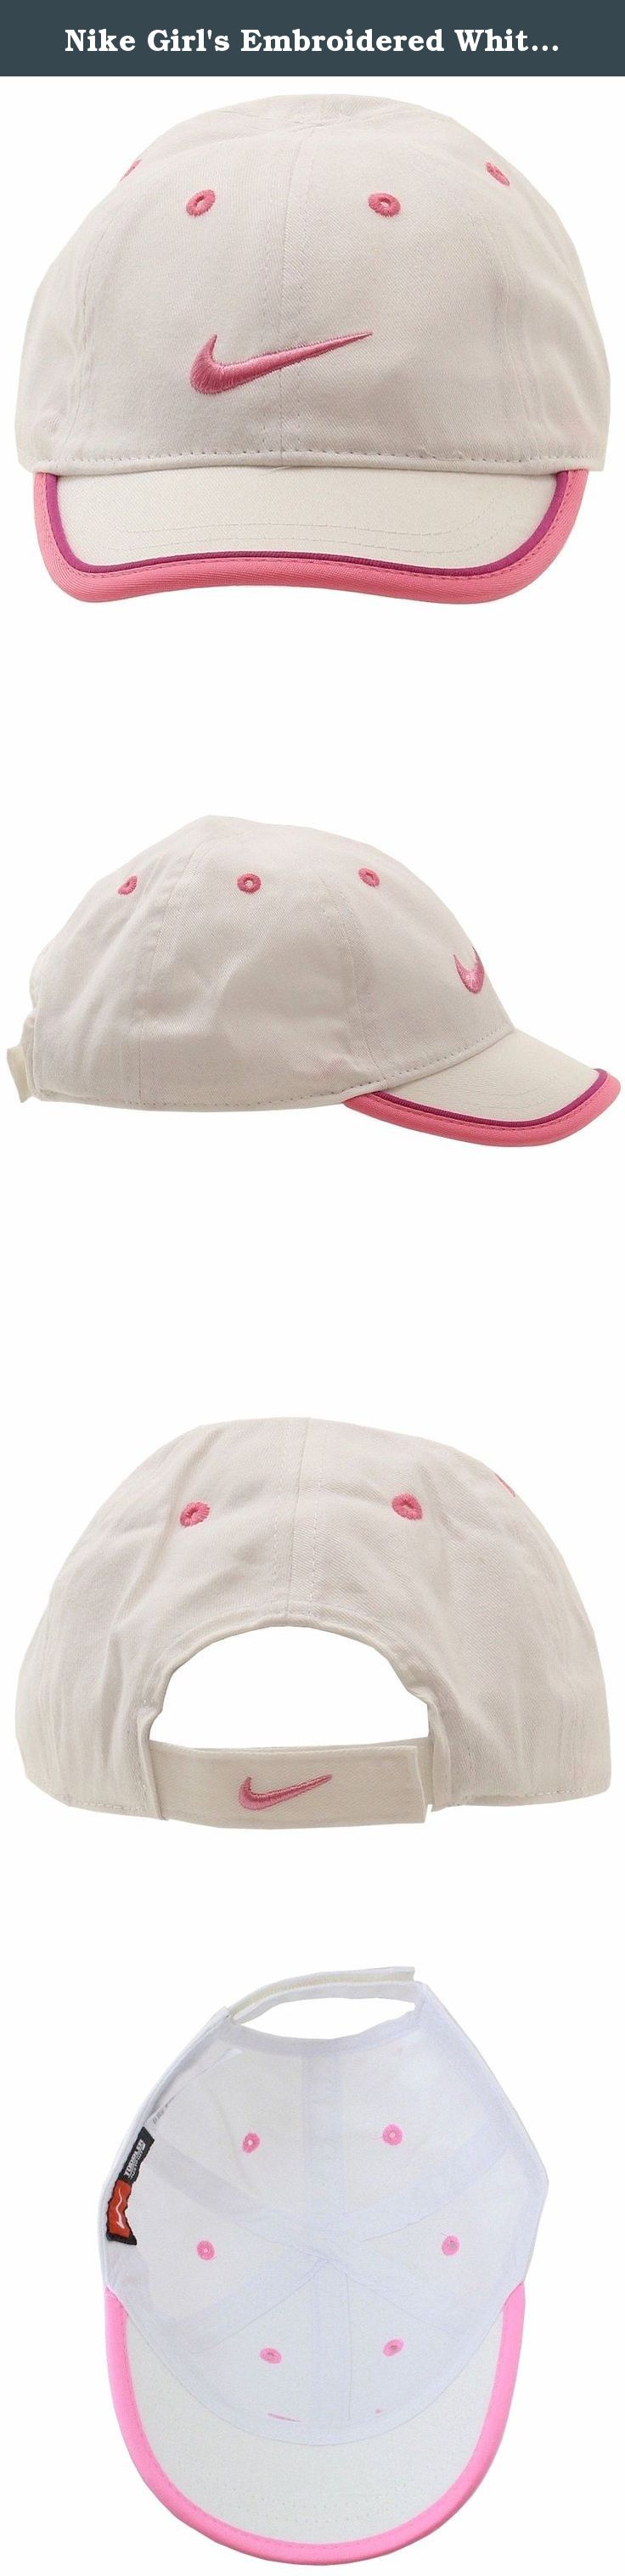 b5291c7d055 Nike Girl s Embroidered White Swoosh Logo Adjustable Hat Baseball Cap Sz  4  6X.